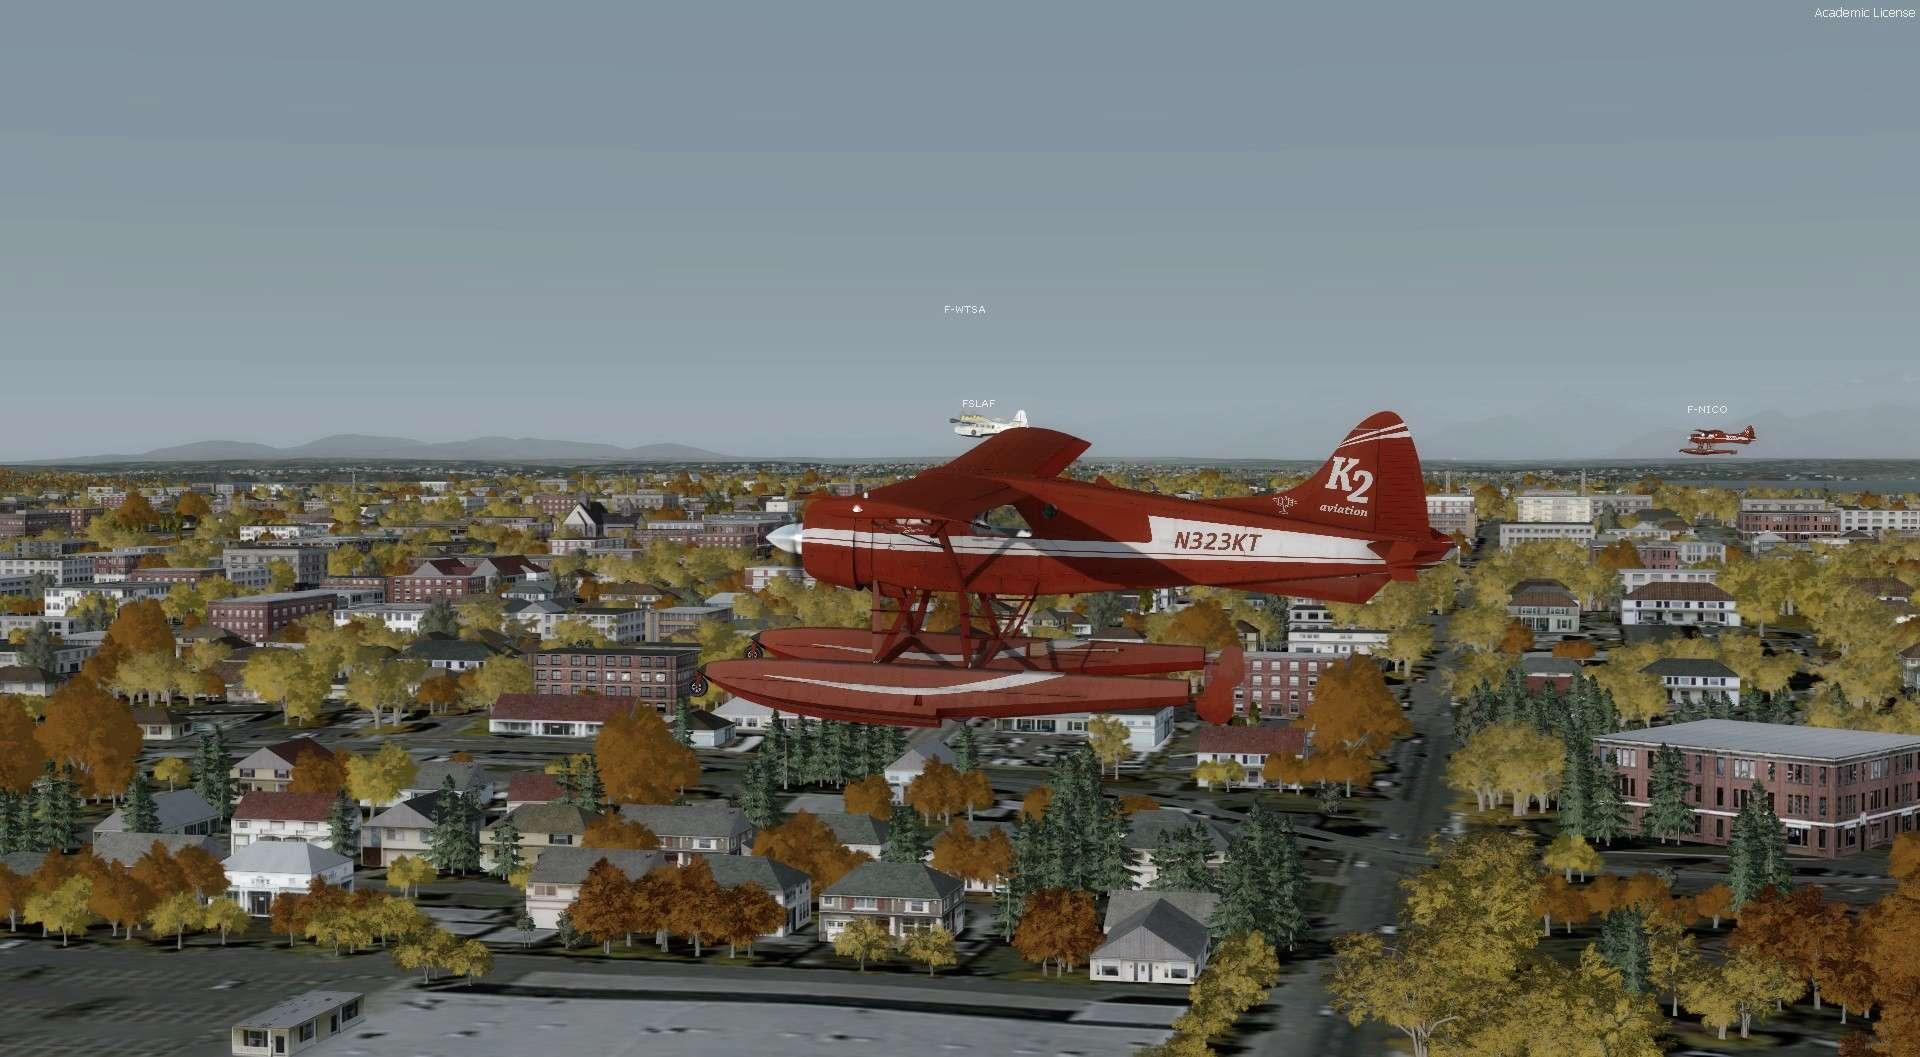 Compte rendu du vol Kenmore Air Harbor (W55) à Kenmore Air Harbor (W55) 2017-121